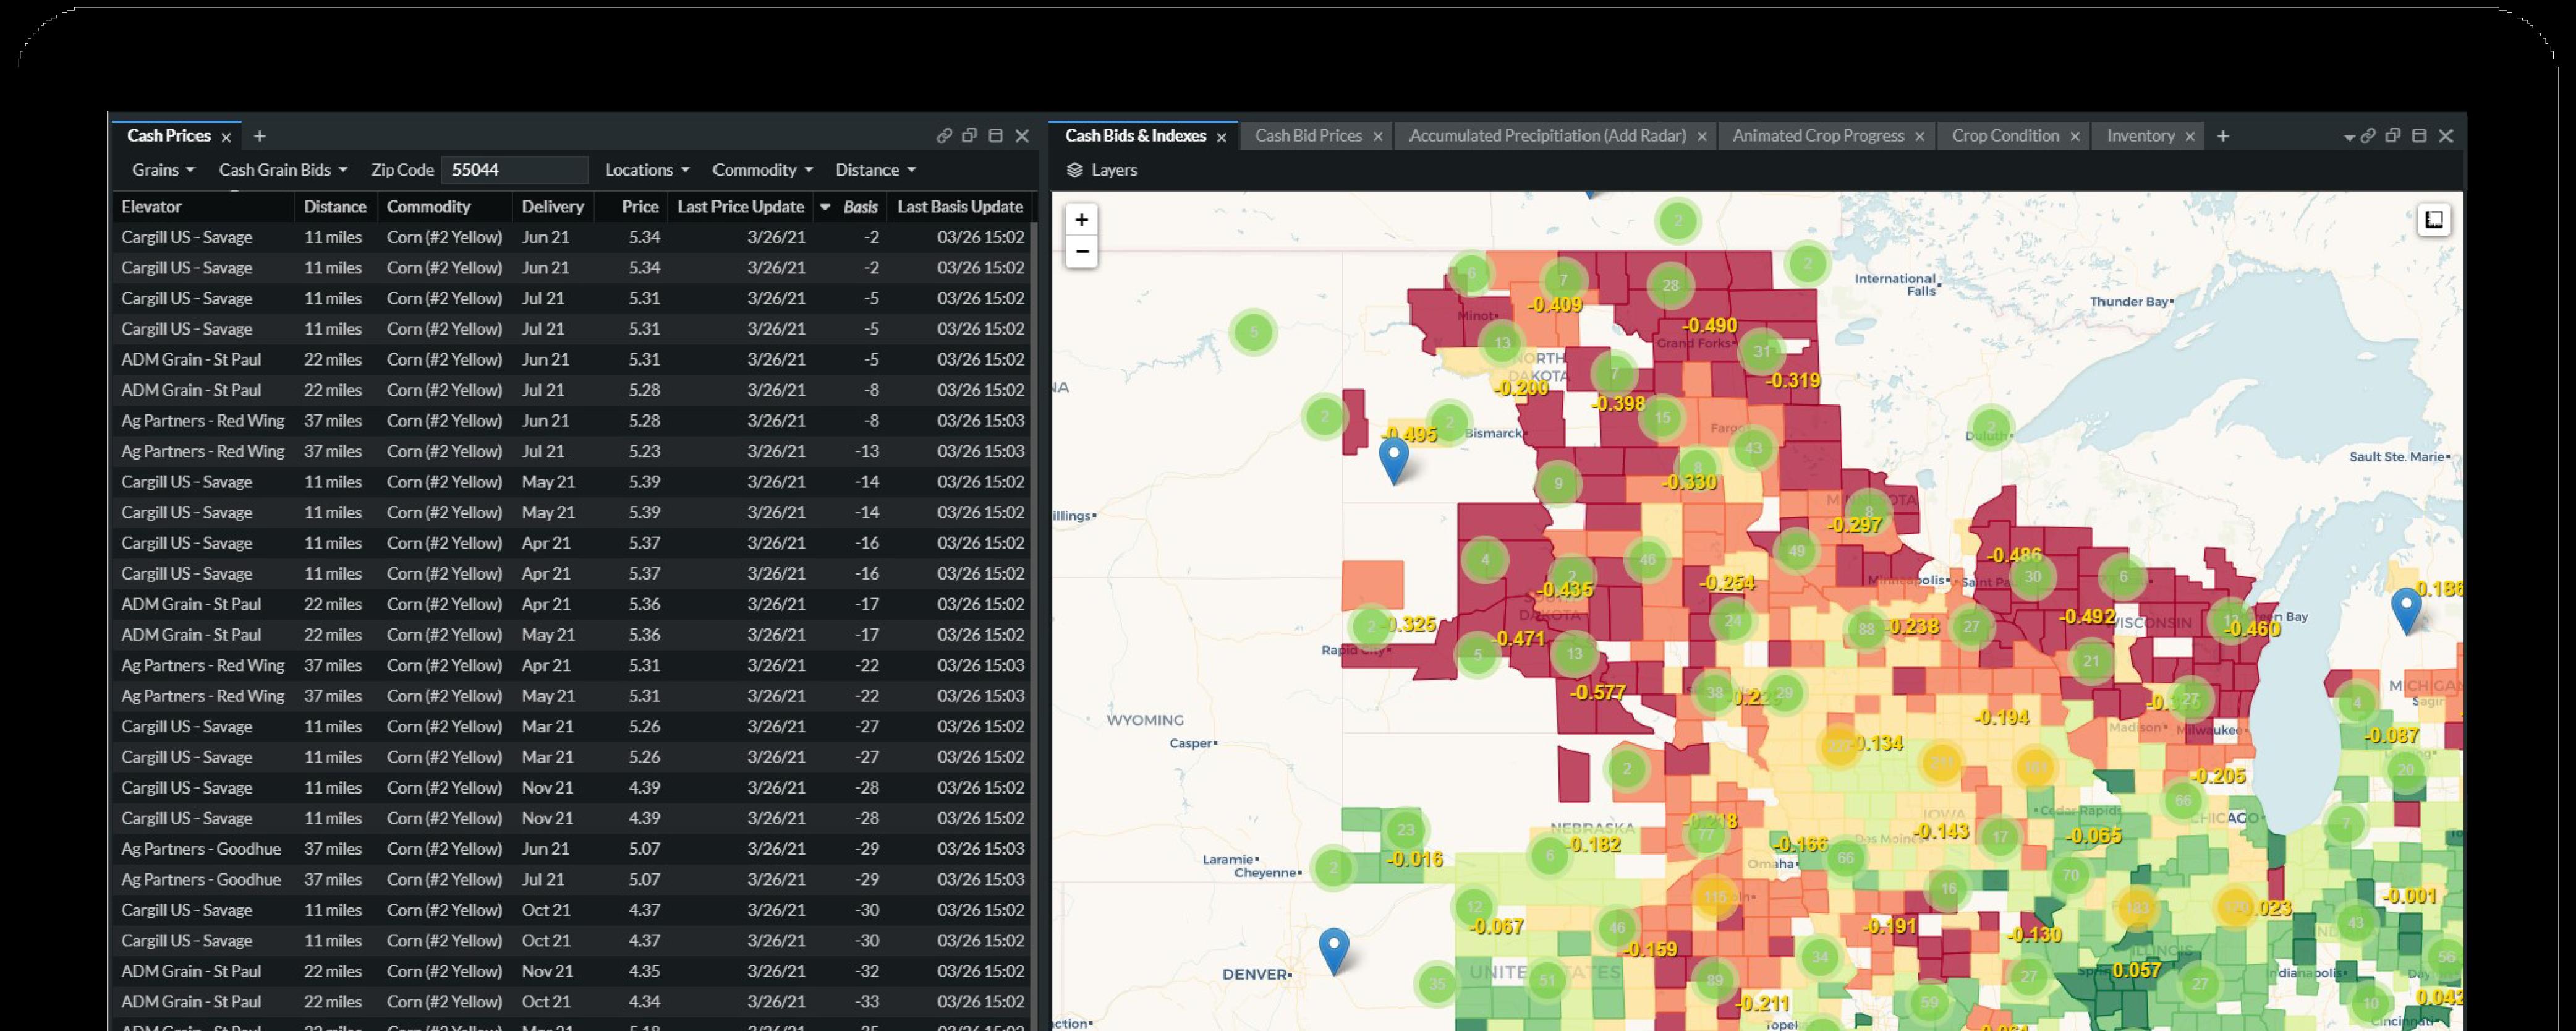 cmdtyView Visually Analyze Commodity Data